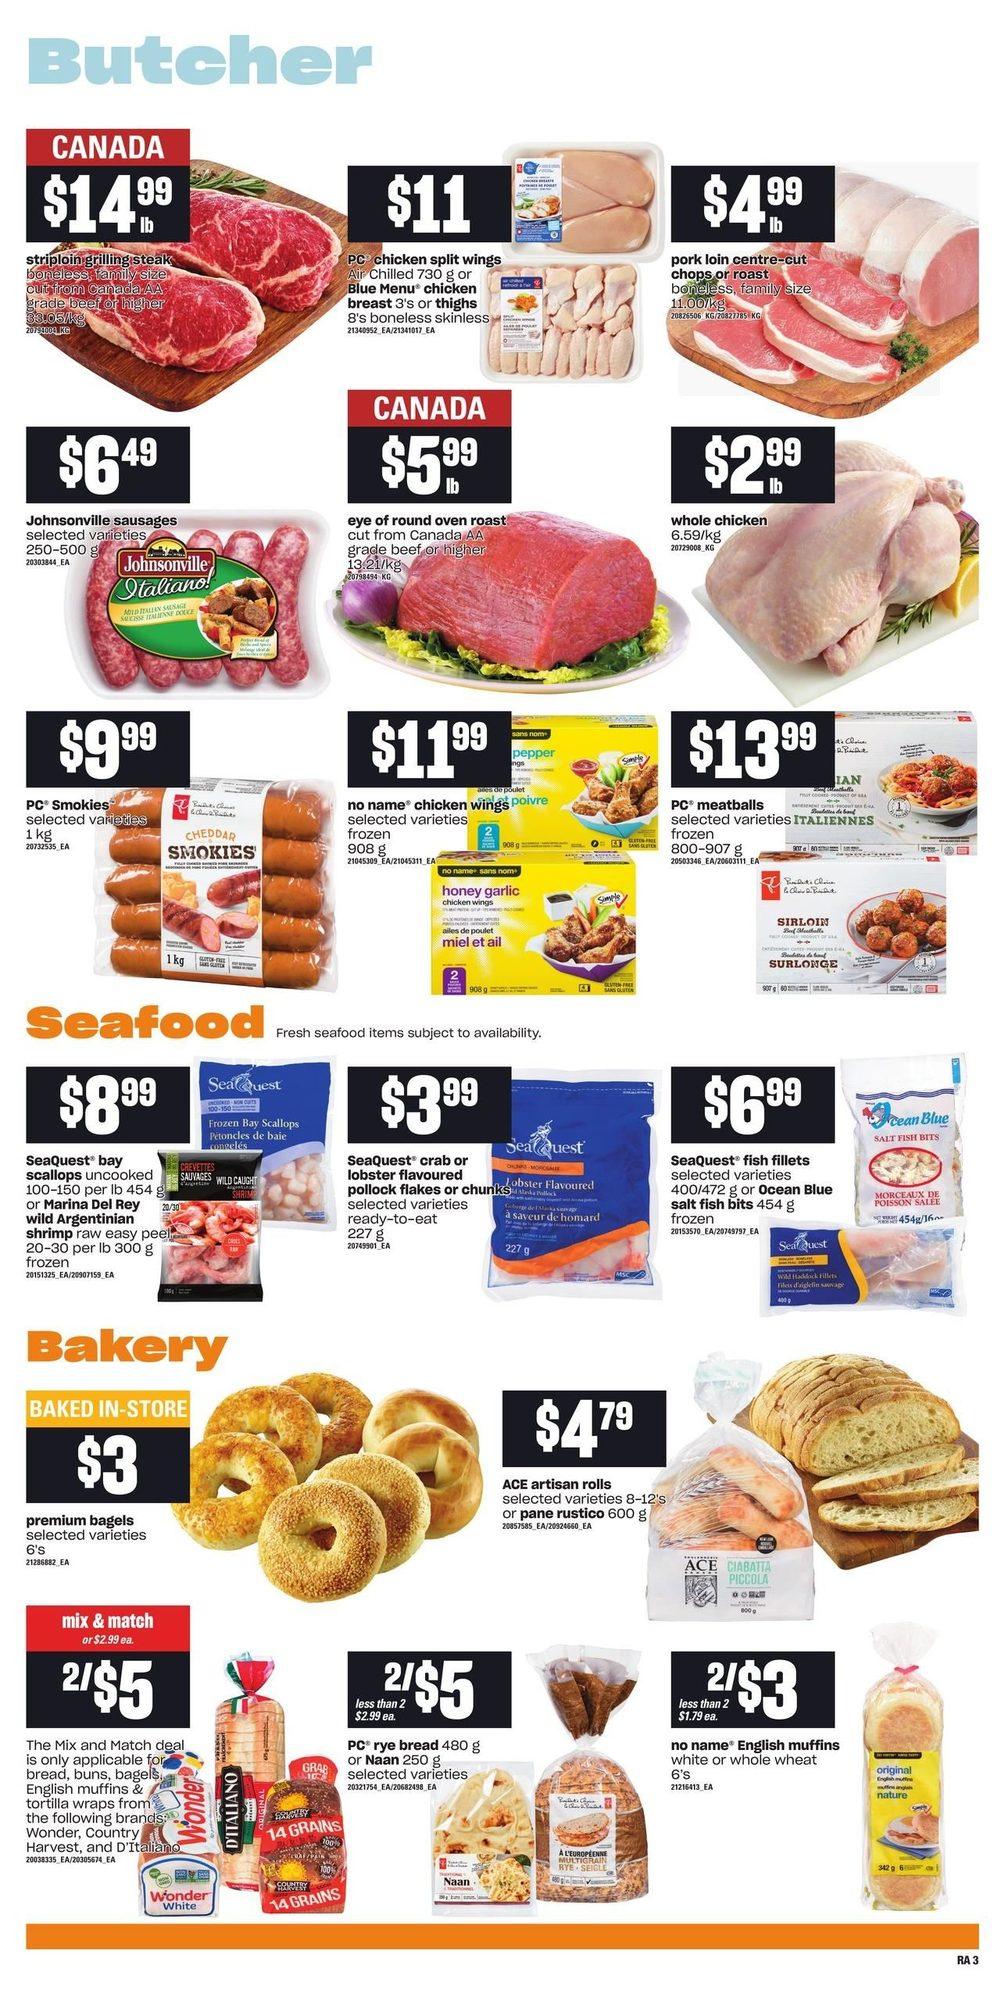 Atlantic Superstore - Weekly Flyer Specials - Page 6